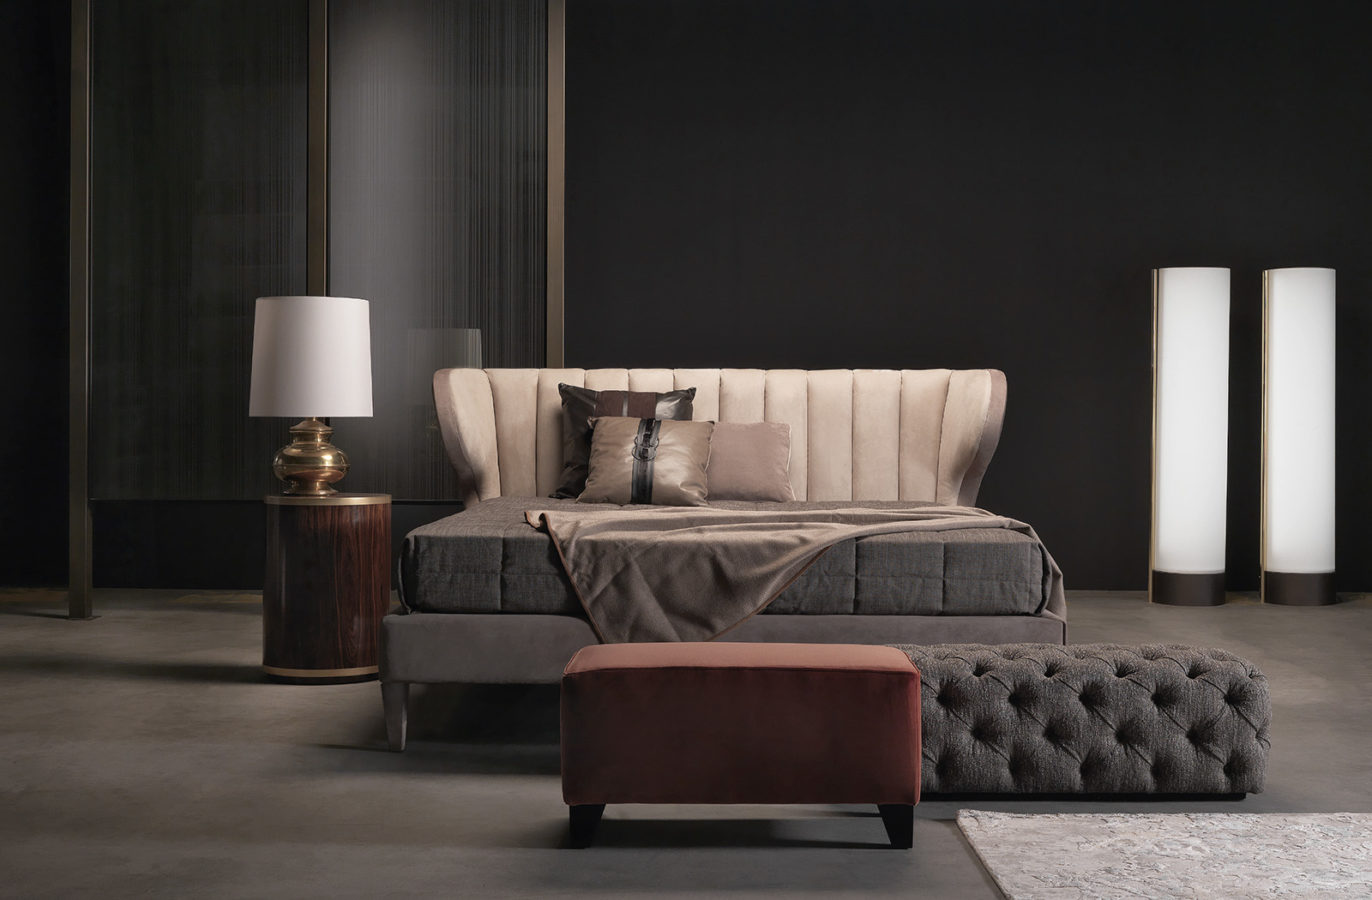 Dunlop Bed 2